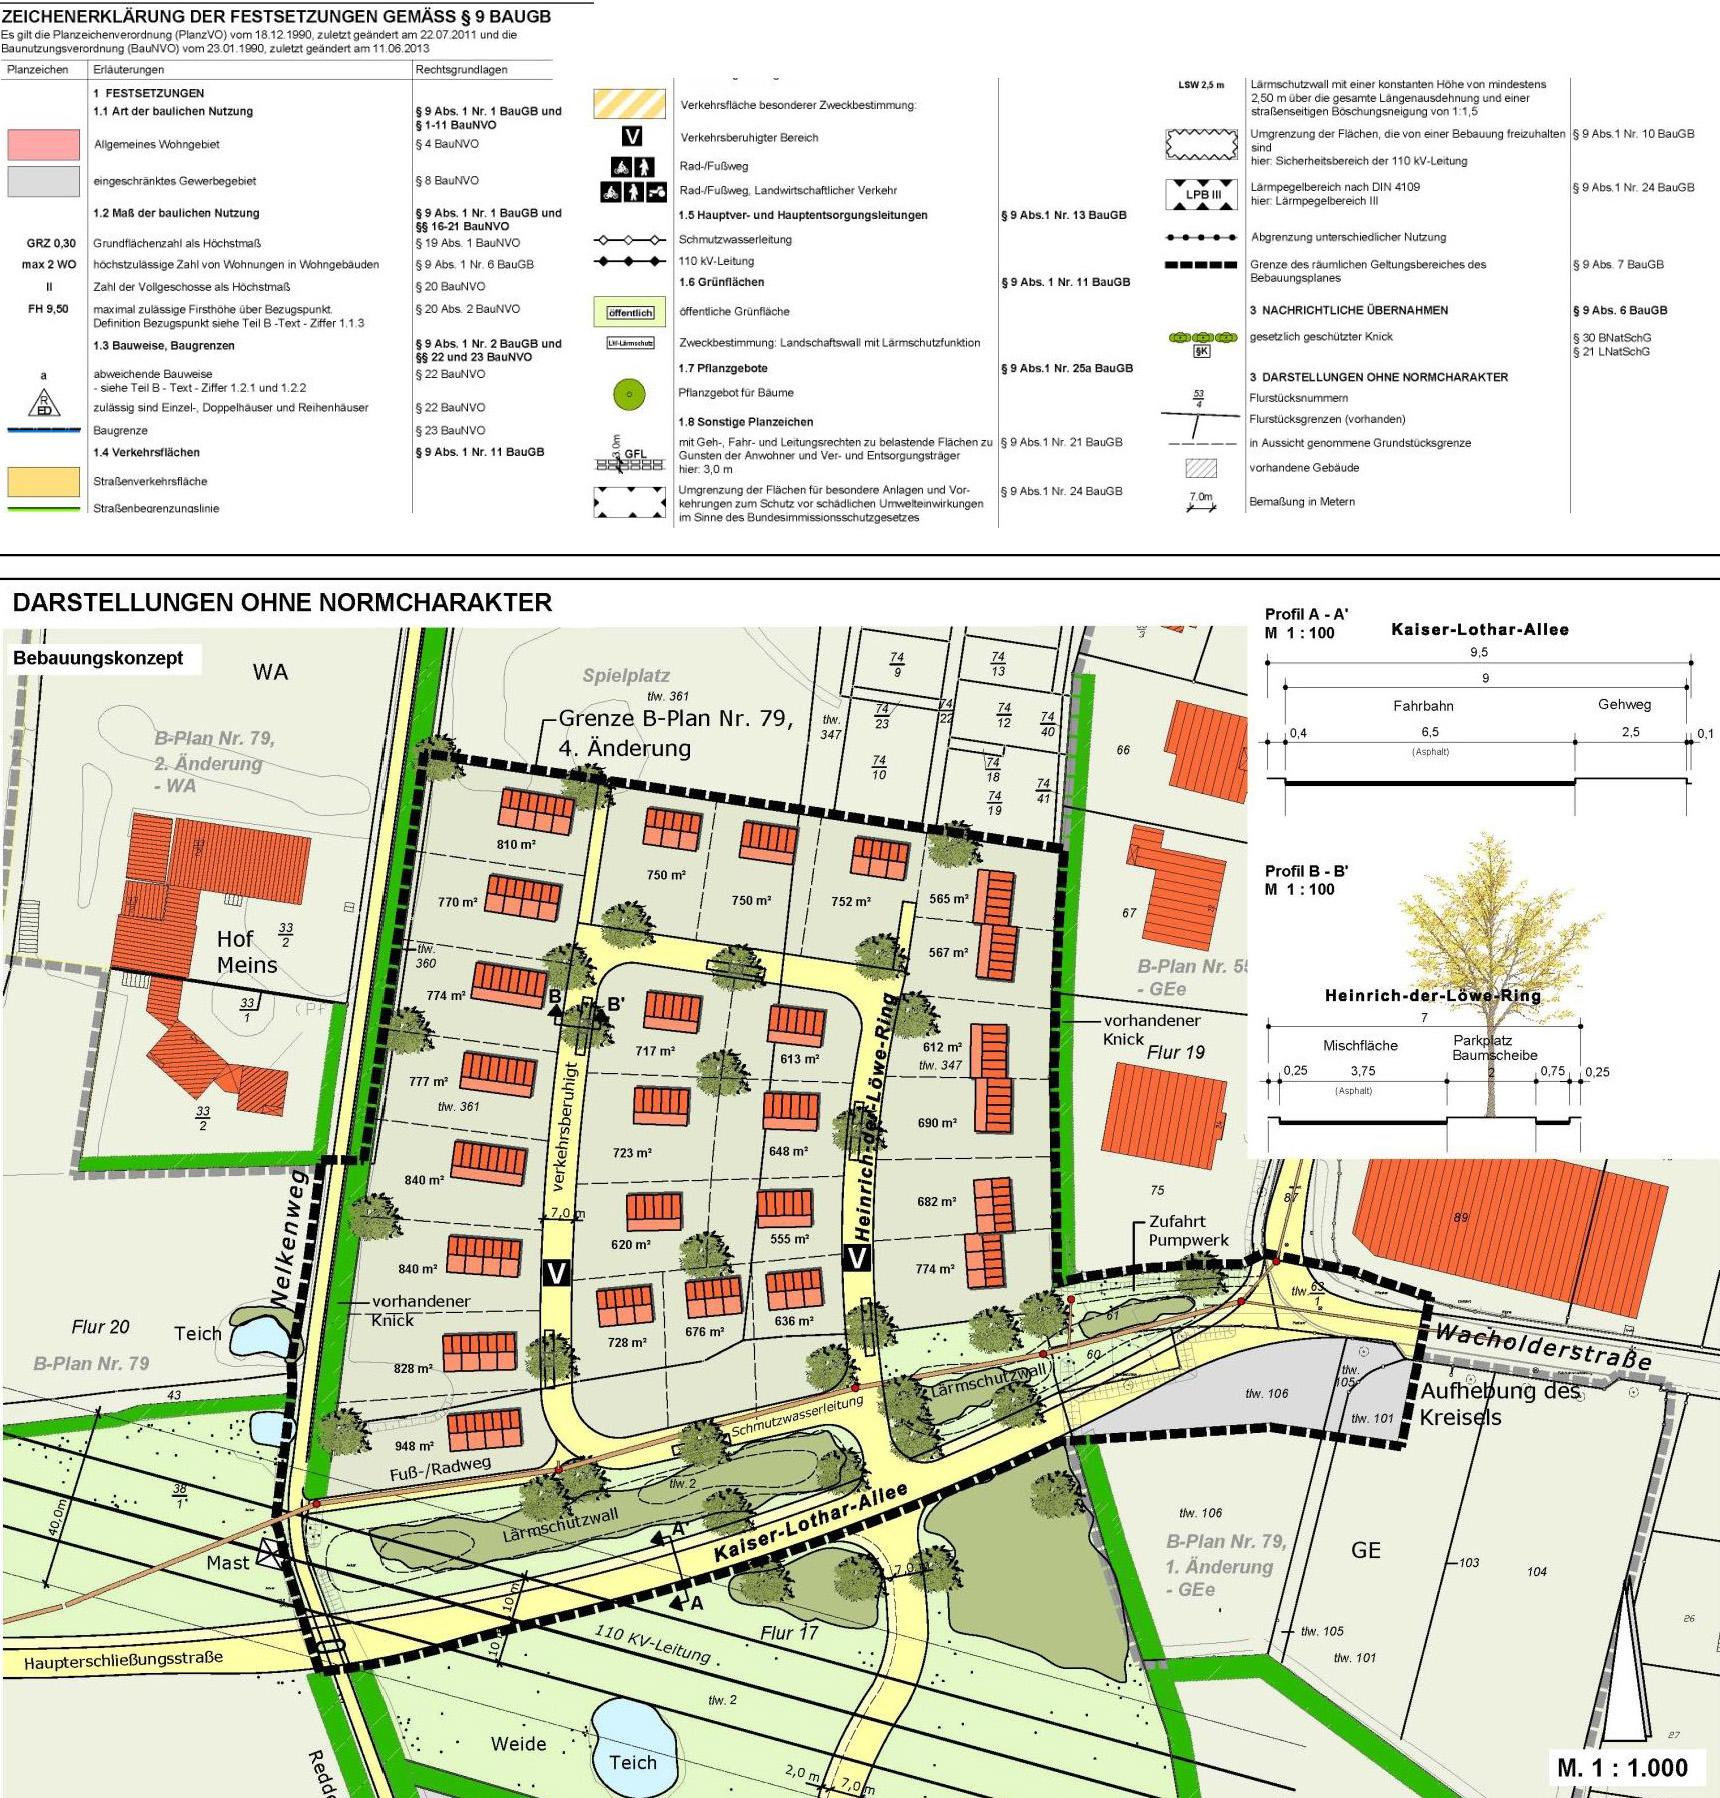 2-urban-planning-%e5%9f%8e%e5%b8%82%e8%a7%84%e5%88%92_%e9%a1%b5%e9%9d%a2_38